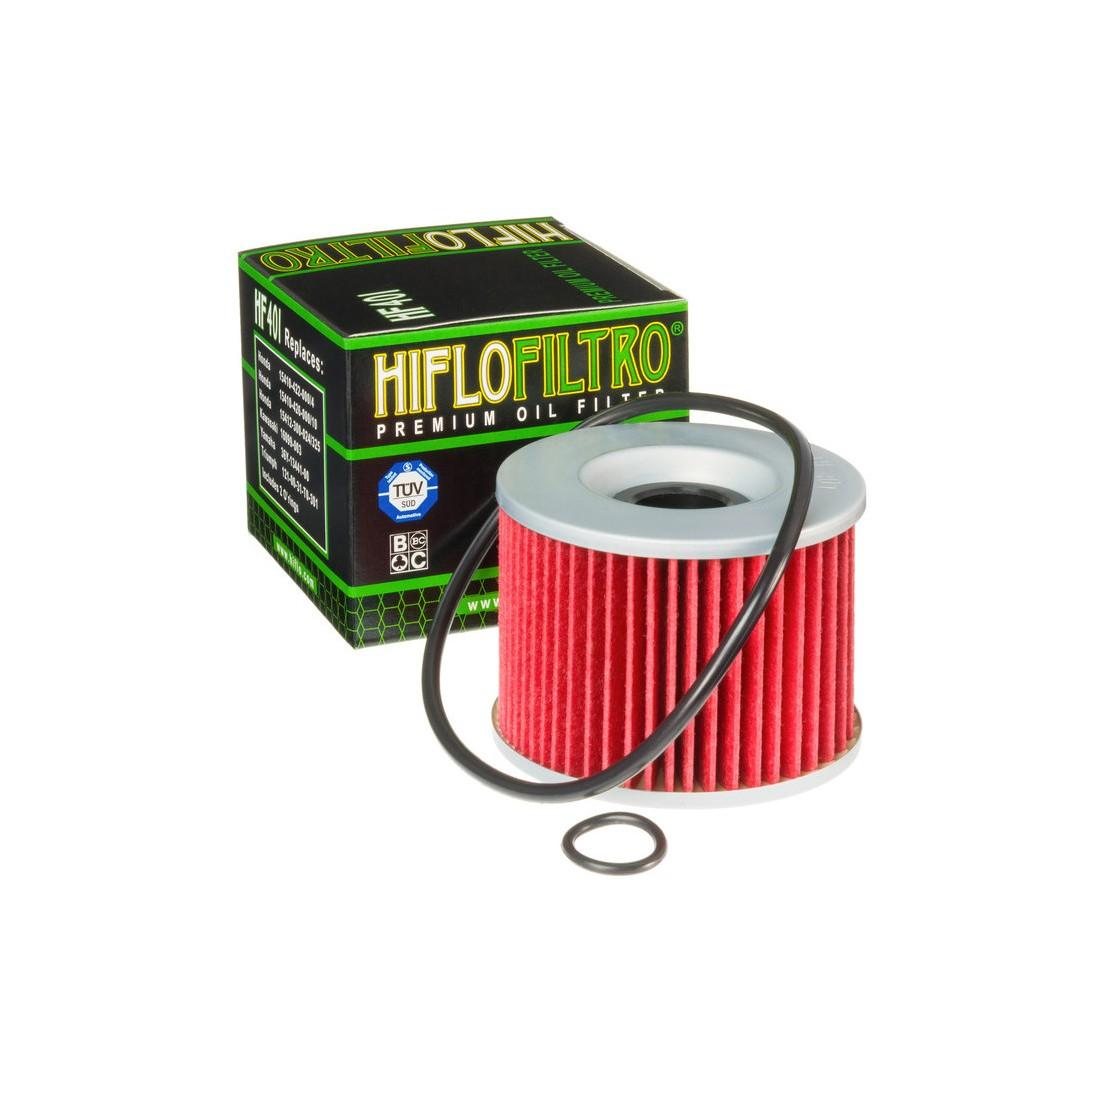 Filtro Aceite Hiflofiltro HF401